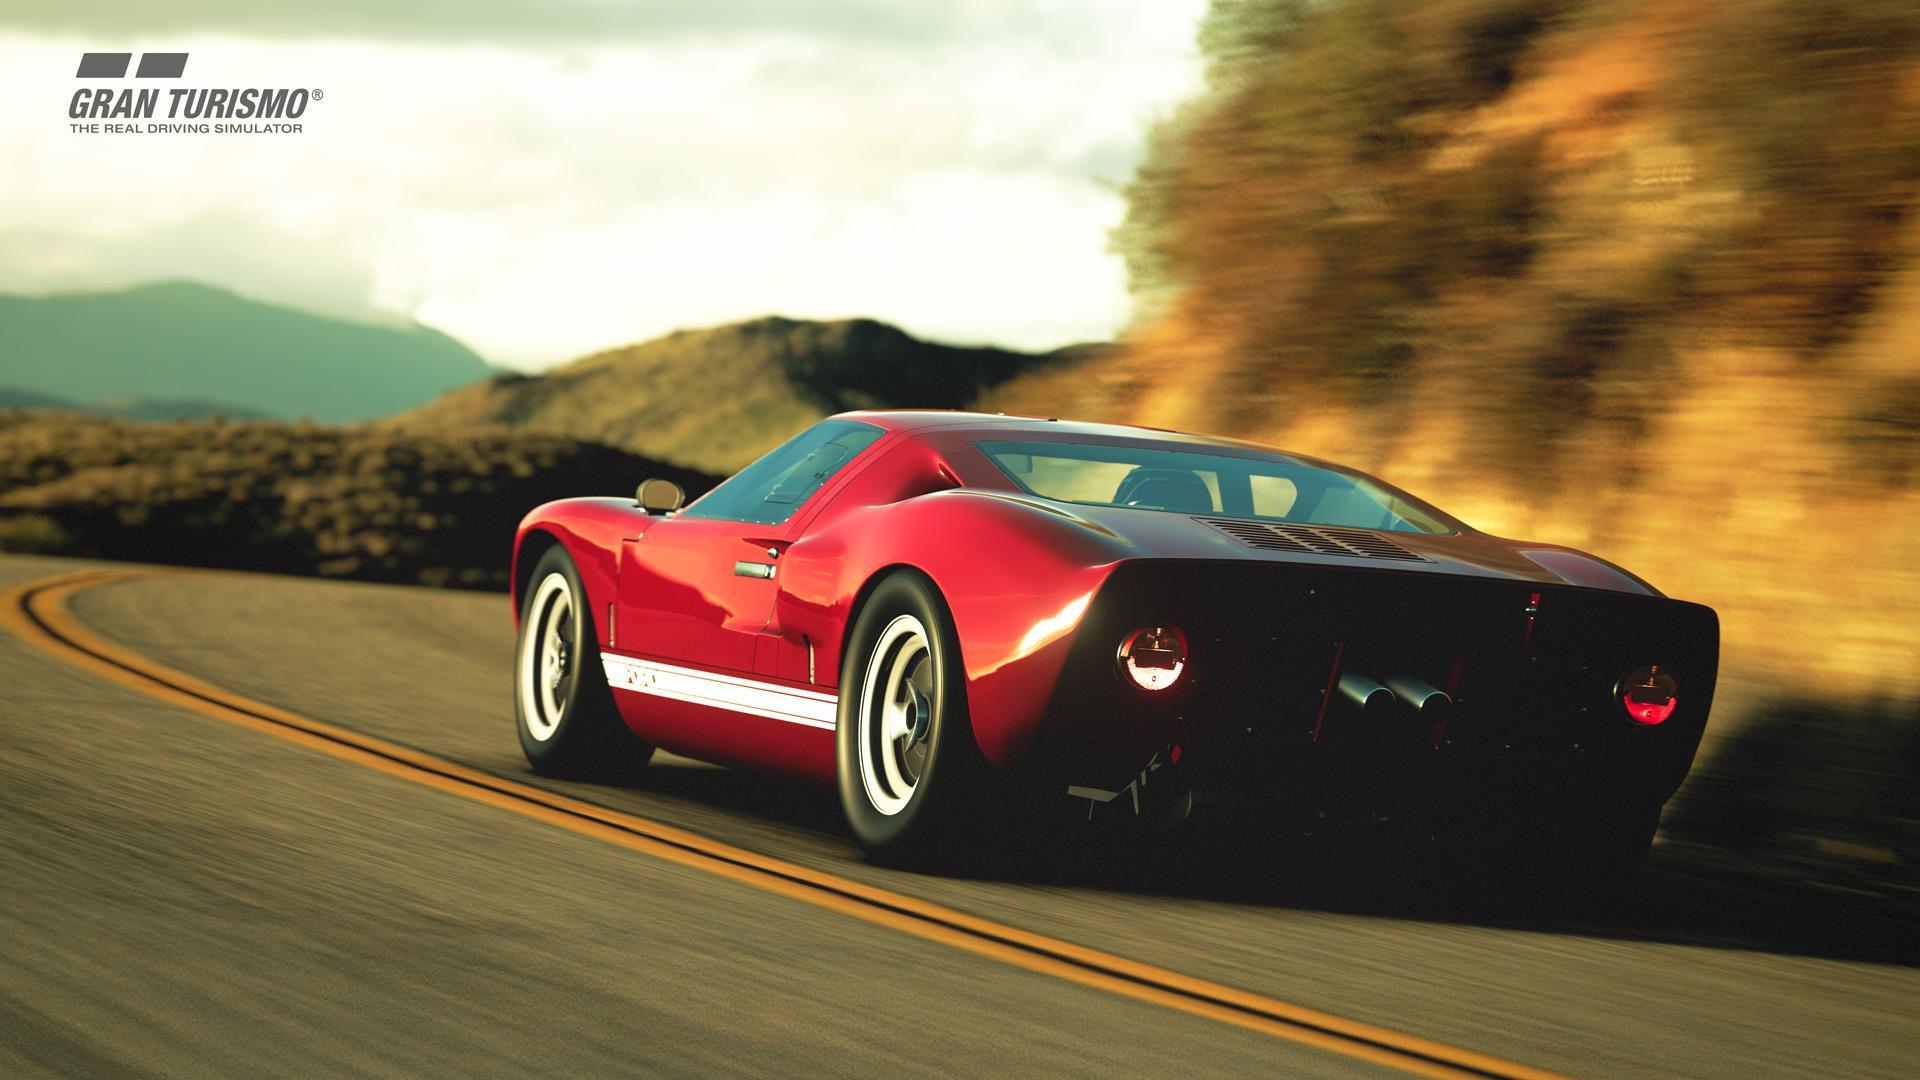 Gt Mustang More Classics In Gran Turismo Sport Update Autoclassics Com